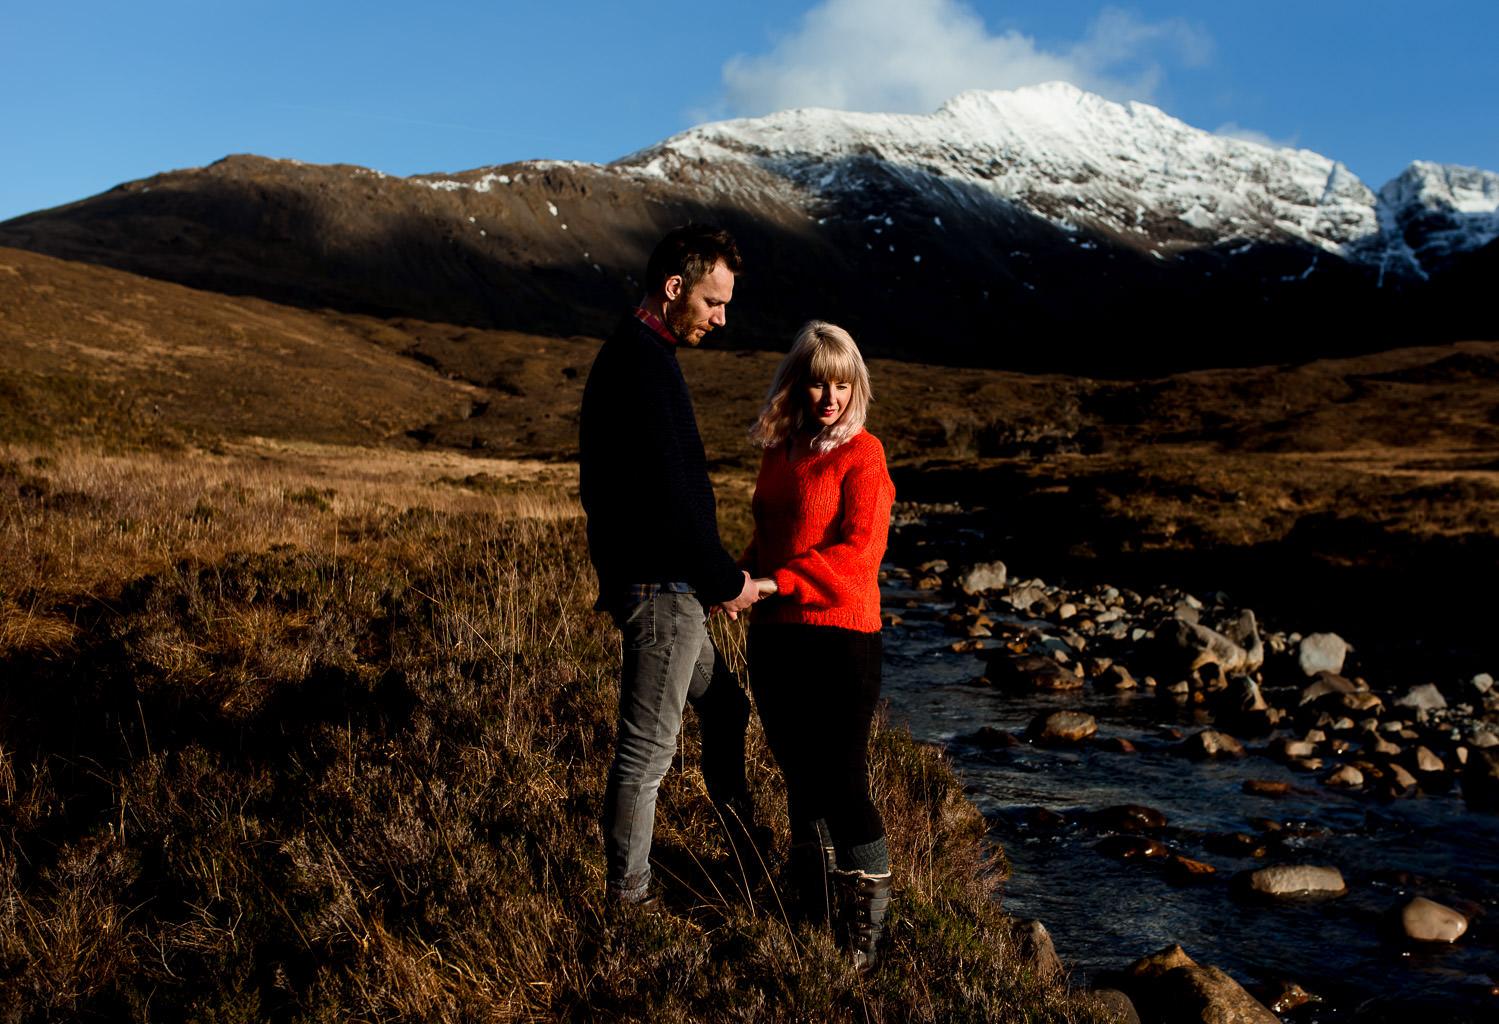 elope to skye, scotland